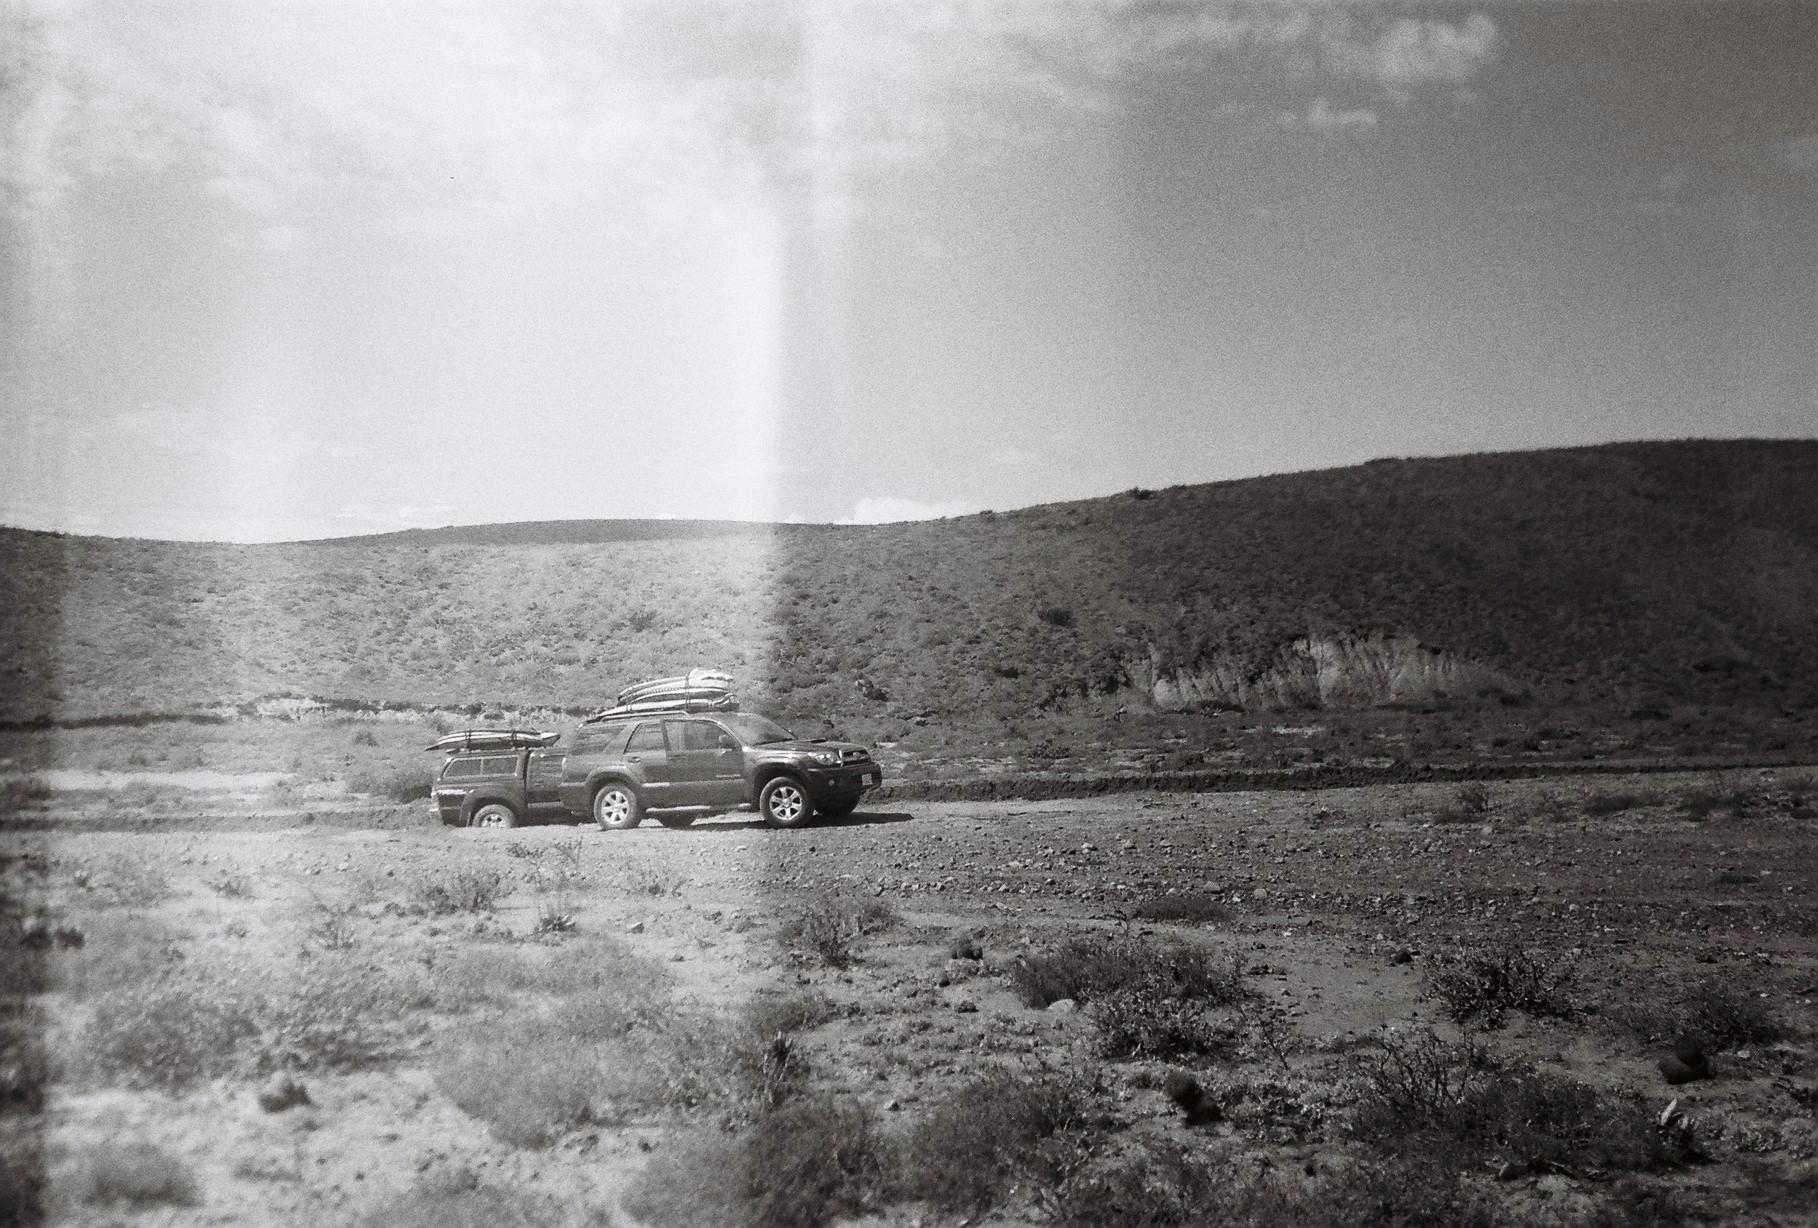 Northern Baja